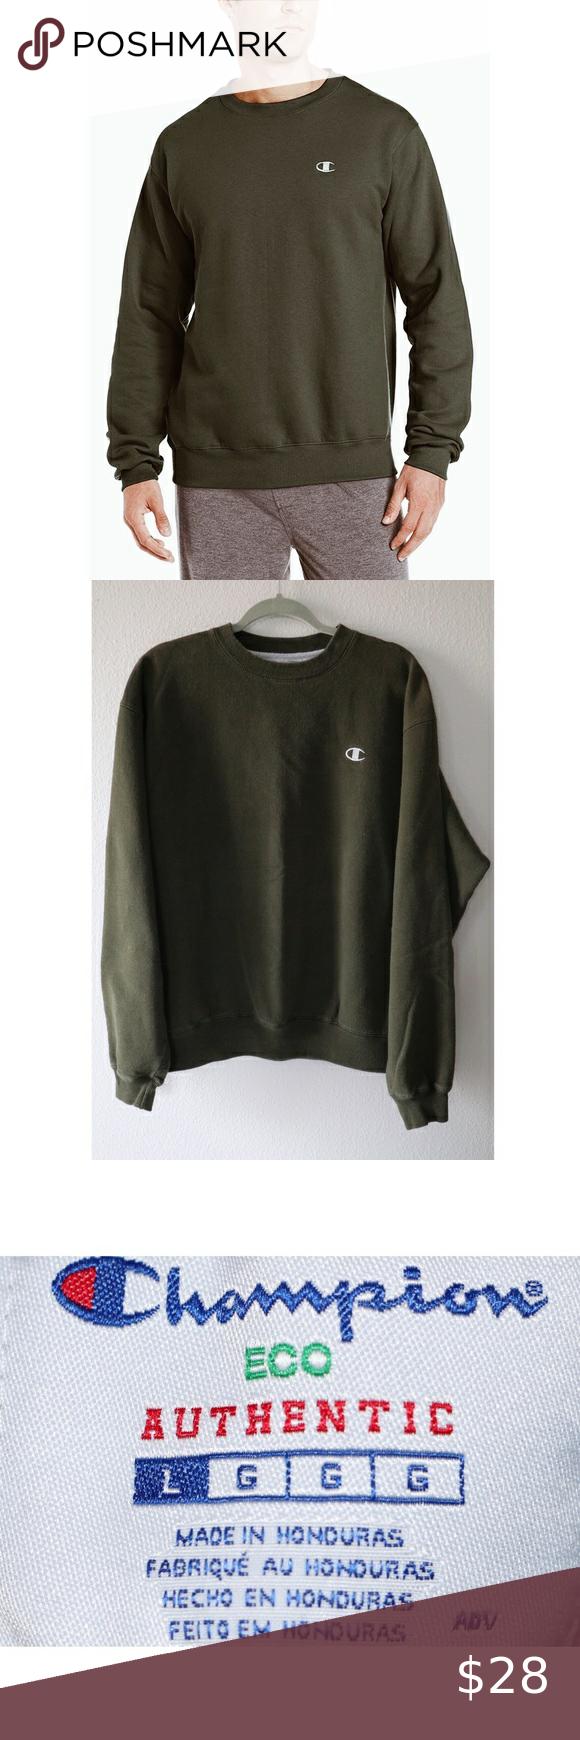 Champion Eco Fleece Pullover Sweater Fleece Pullover Pullover Sweaters Sweaters [ 1740 x 580 Pixel ]